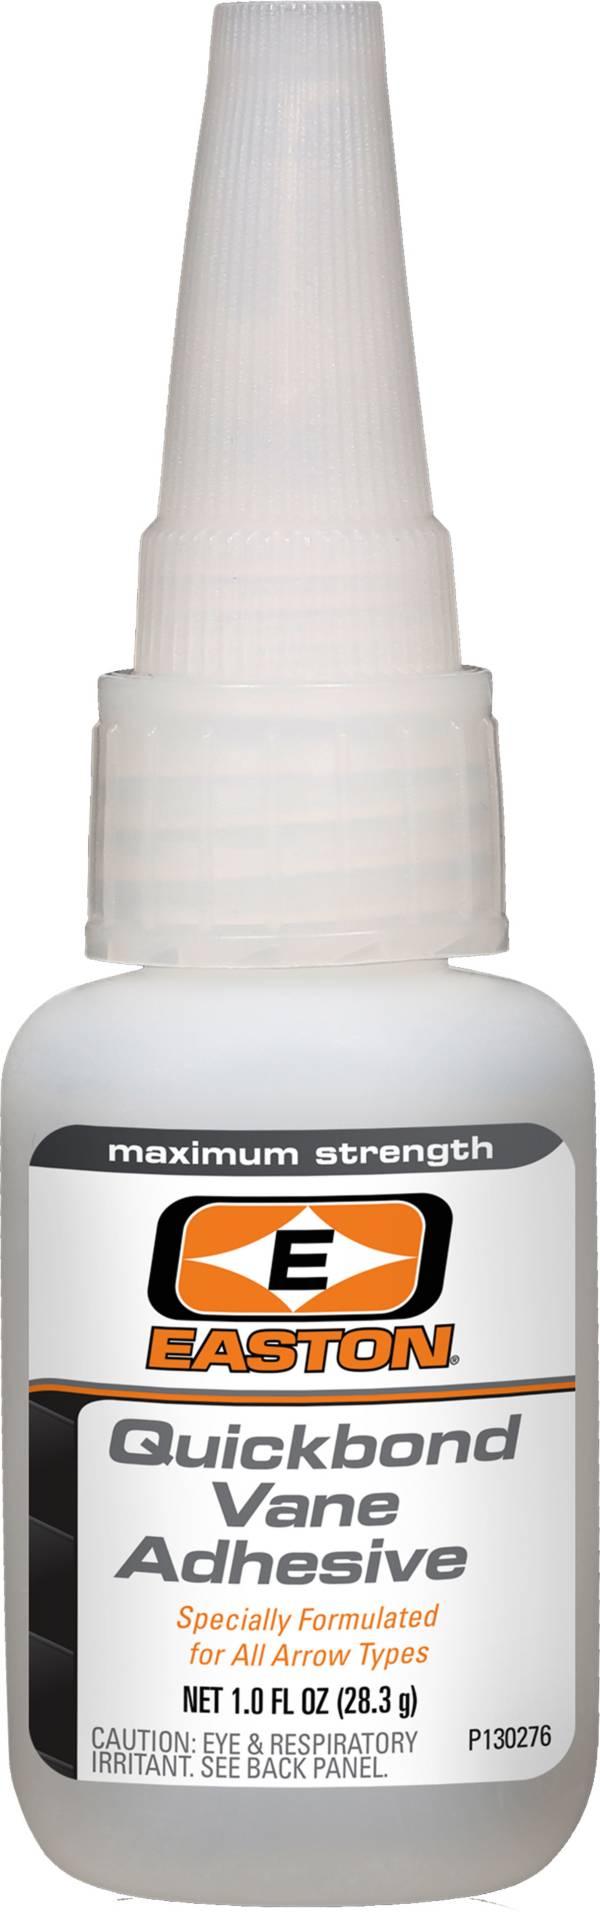 Easton Quick Bond Vane Adhesive product image